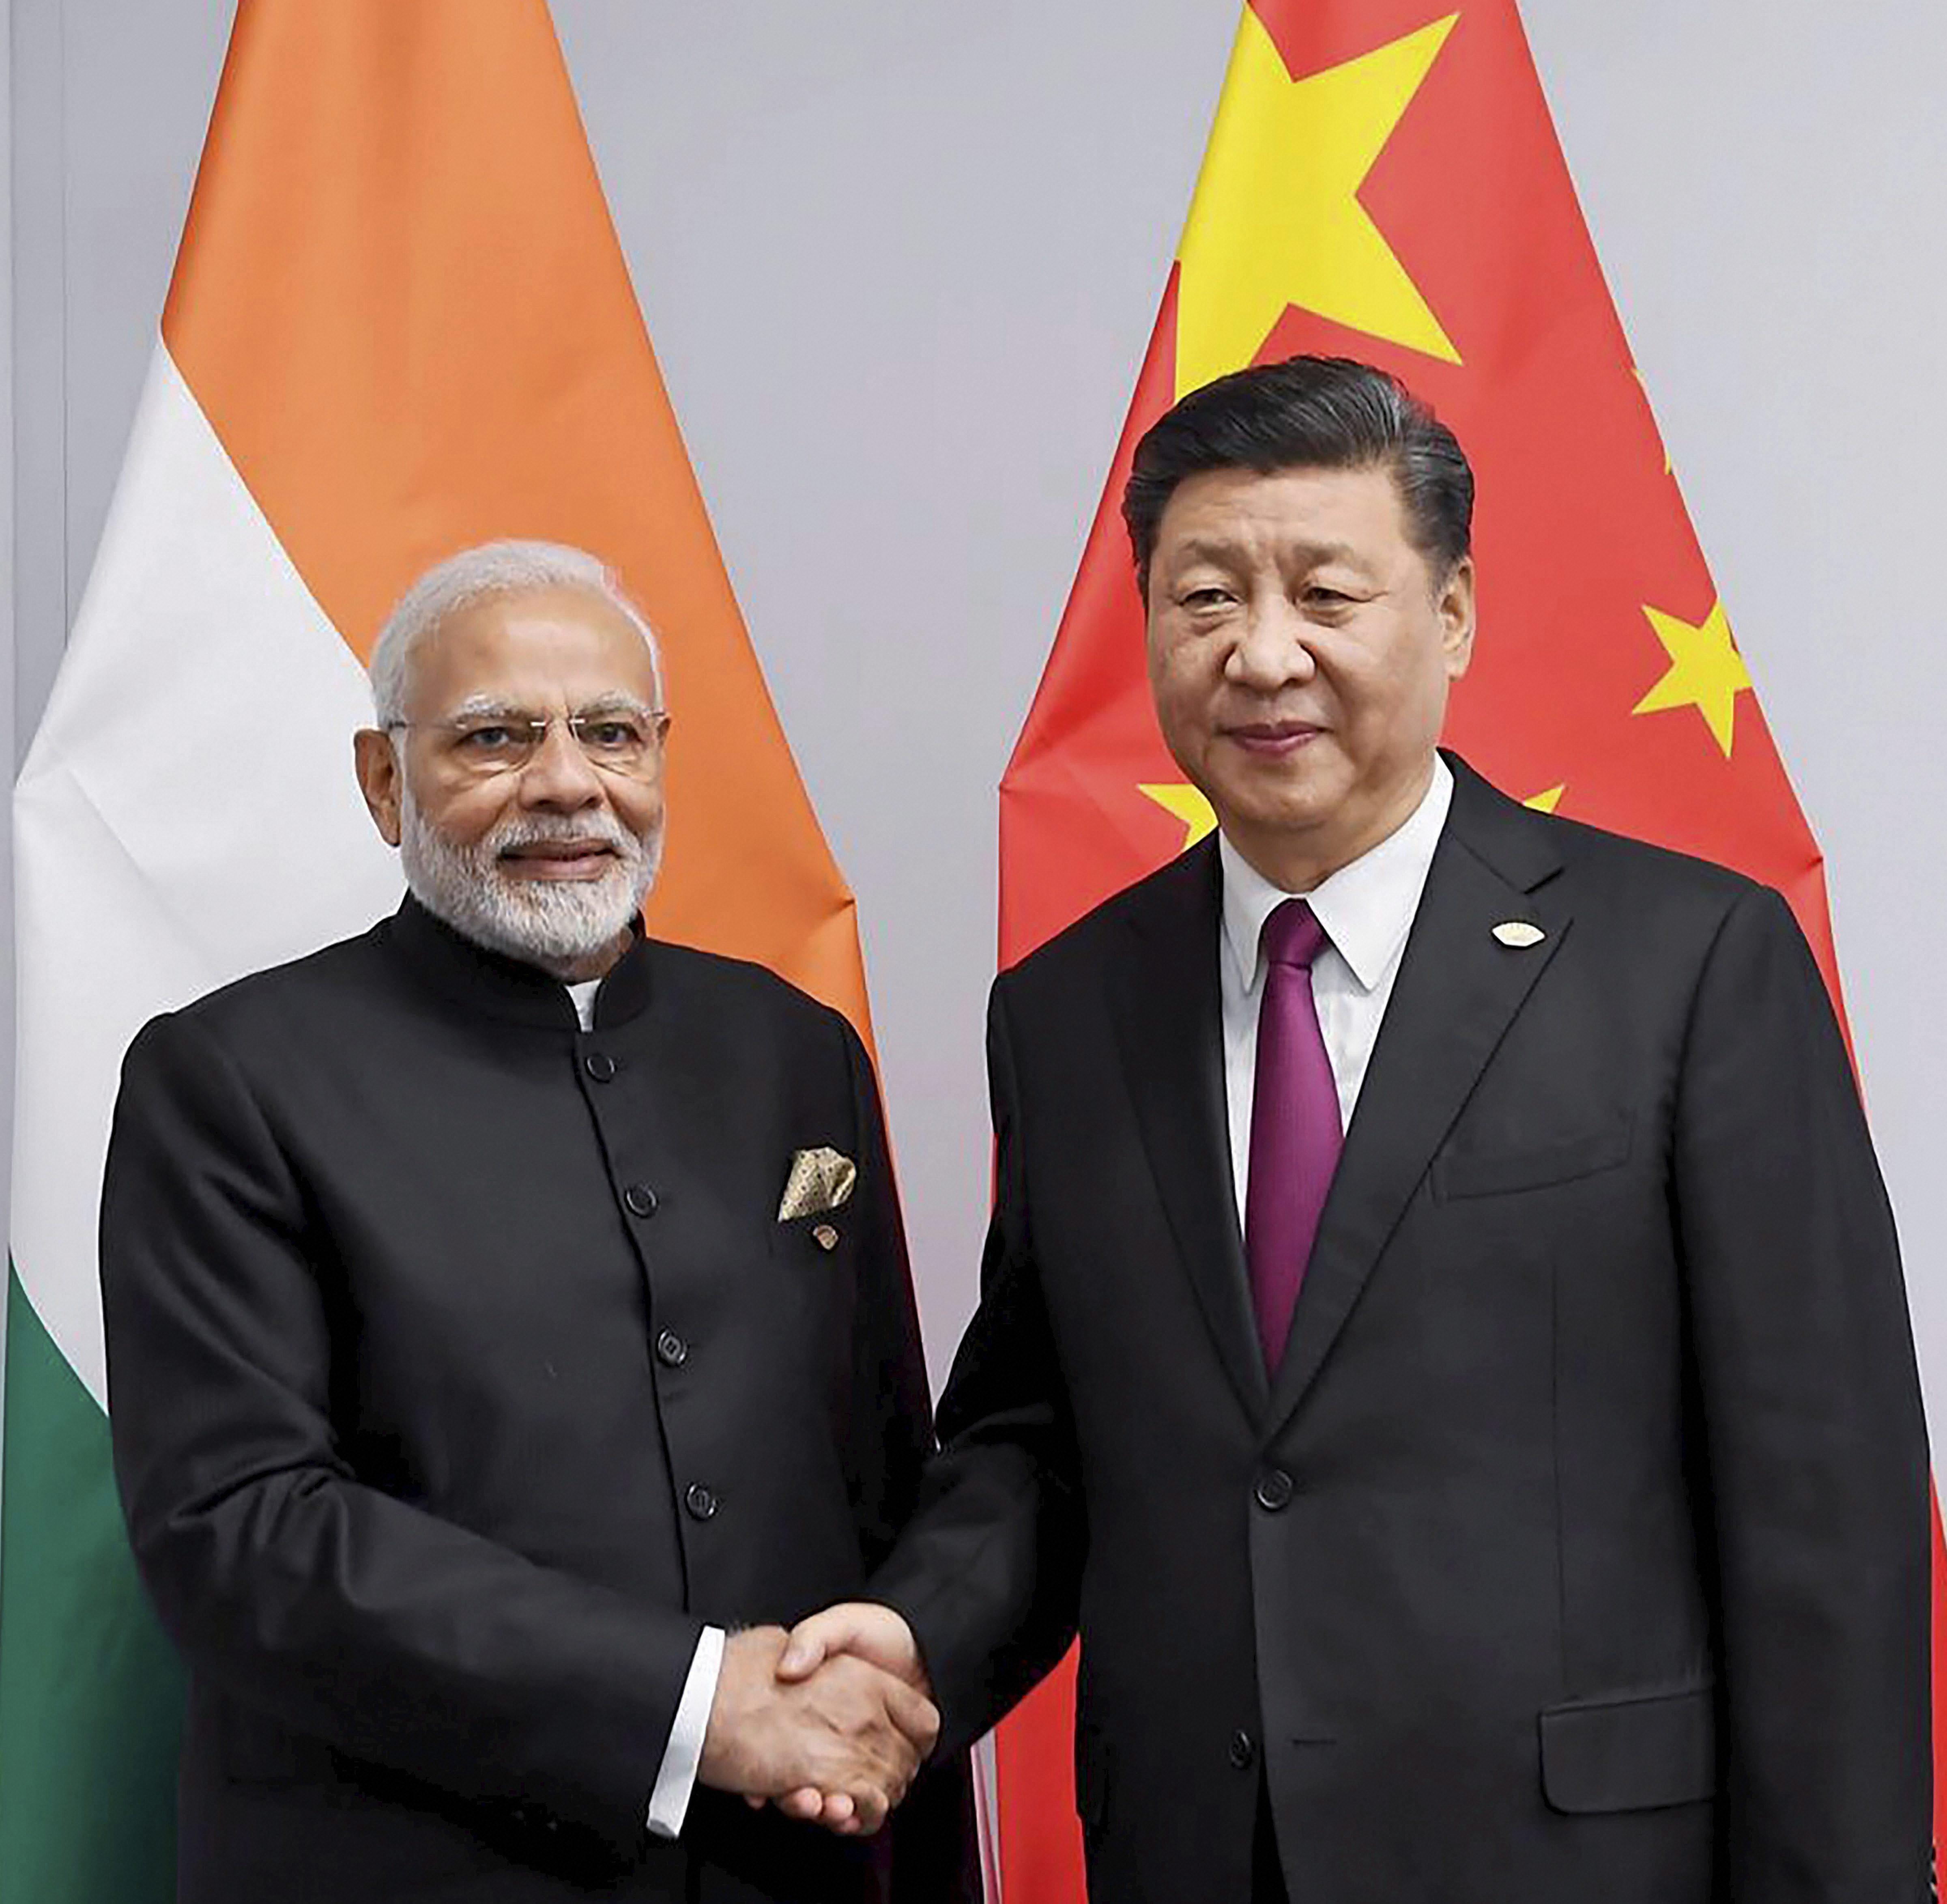 G-20 summit: India presents 9-point agenda on fugitive economic offenders